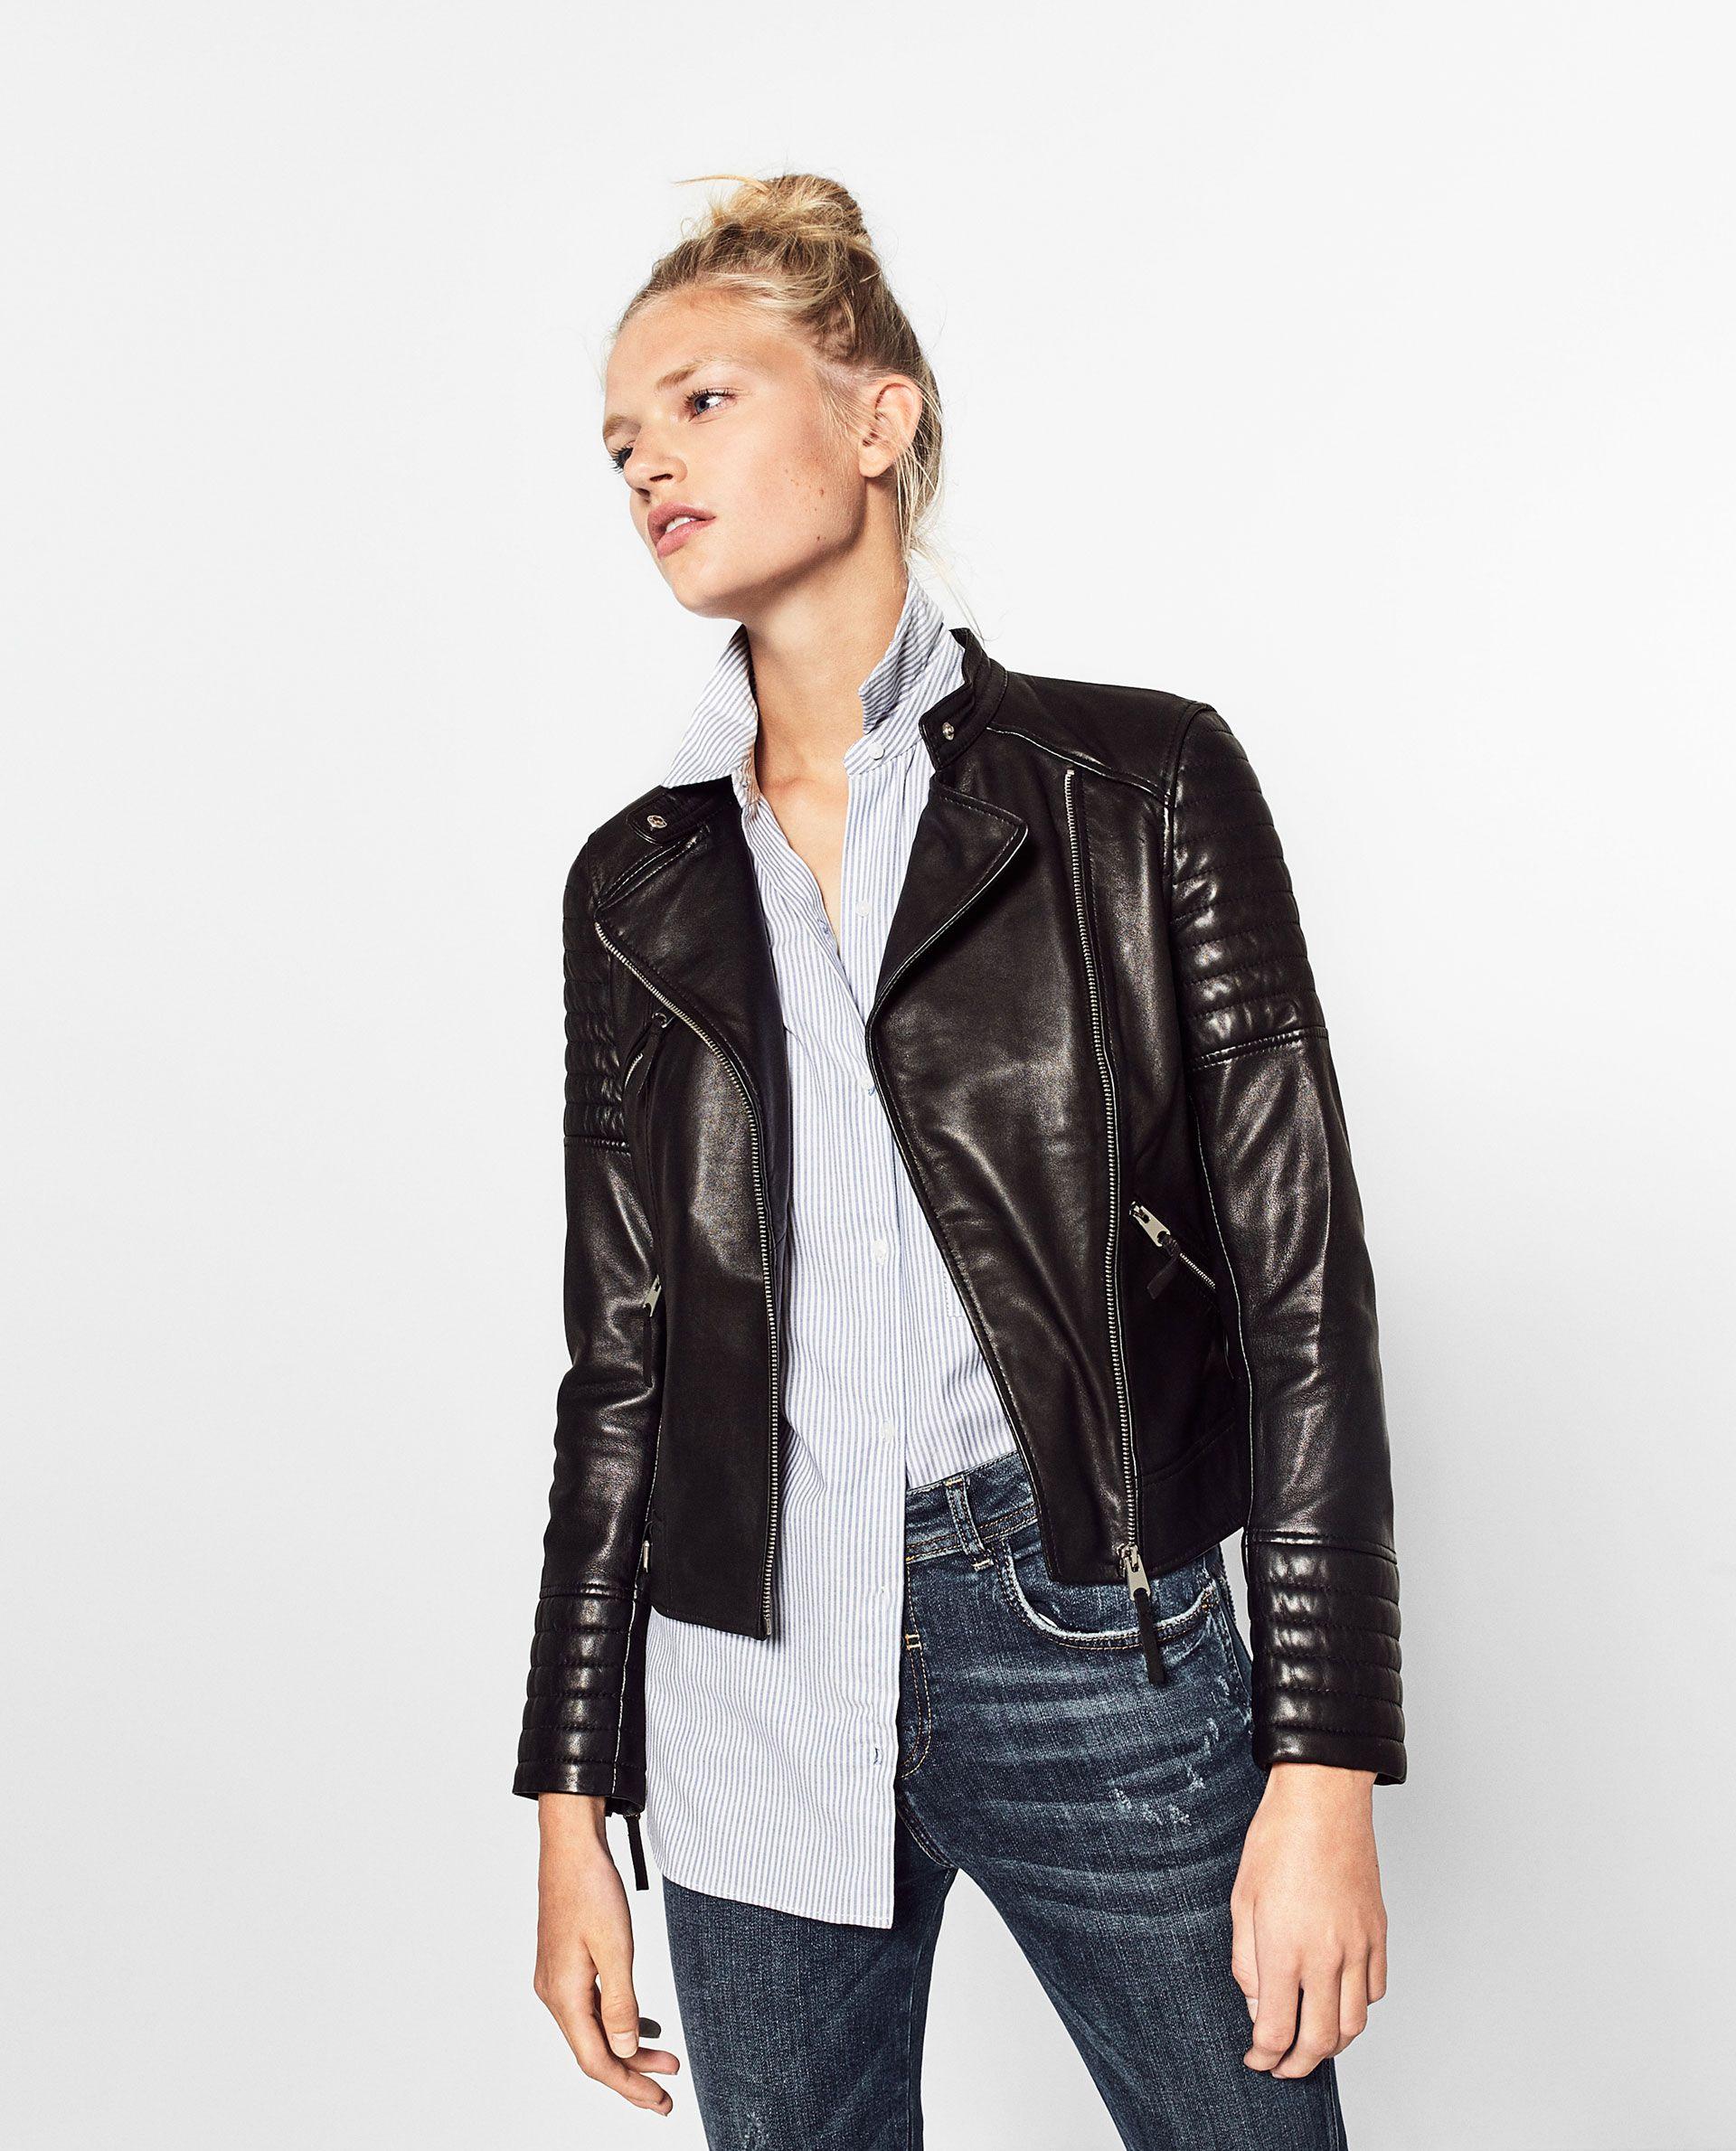 Jaqueta pele fechos (preto): ZARA TRF (89,95€)